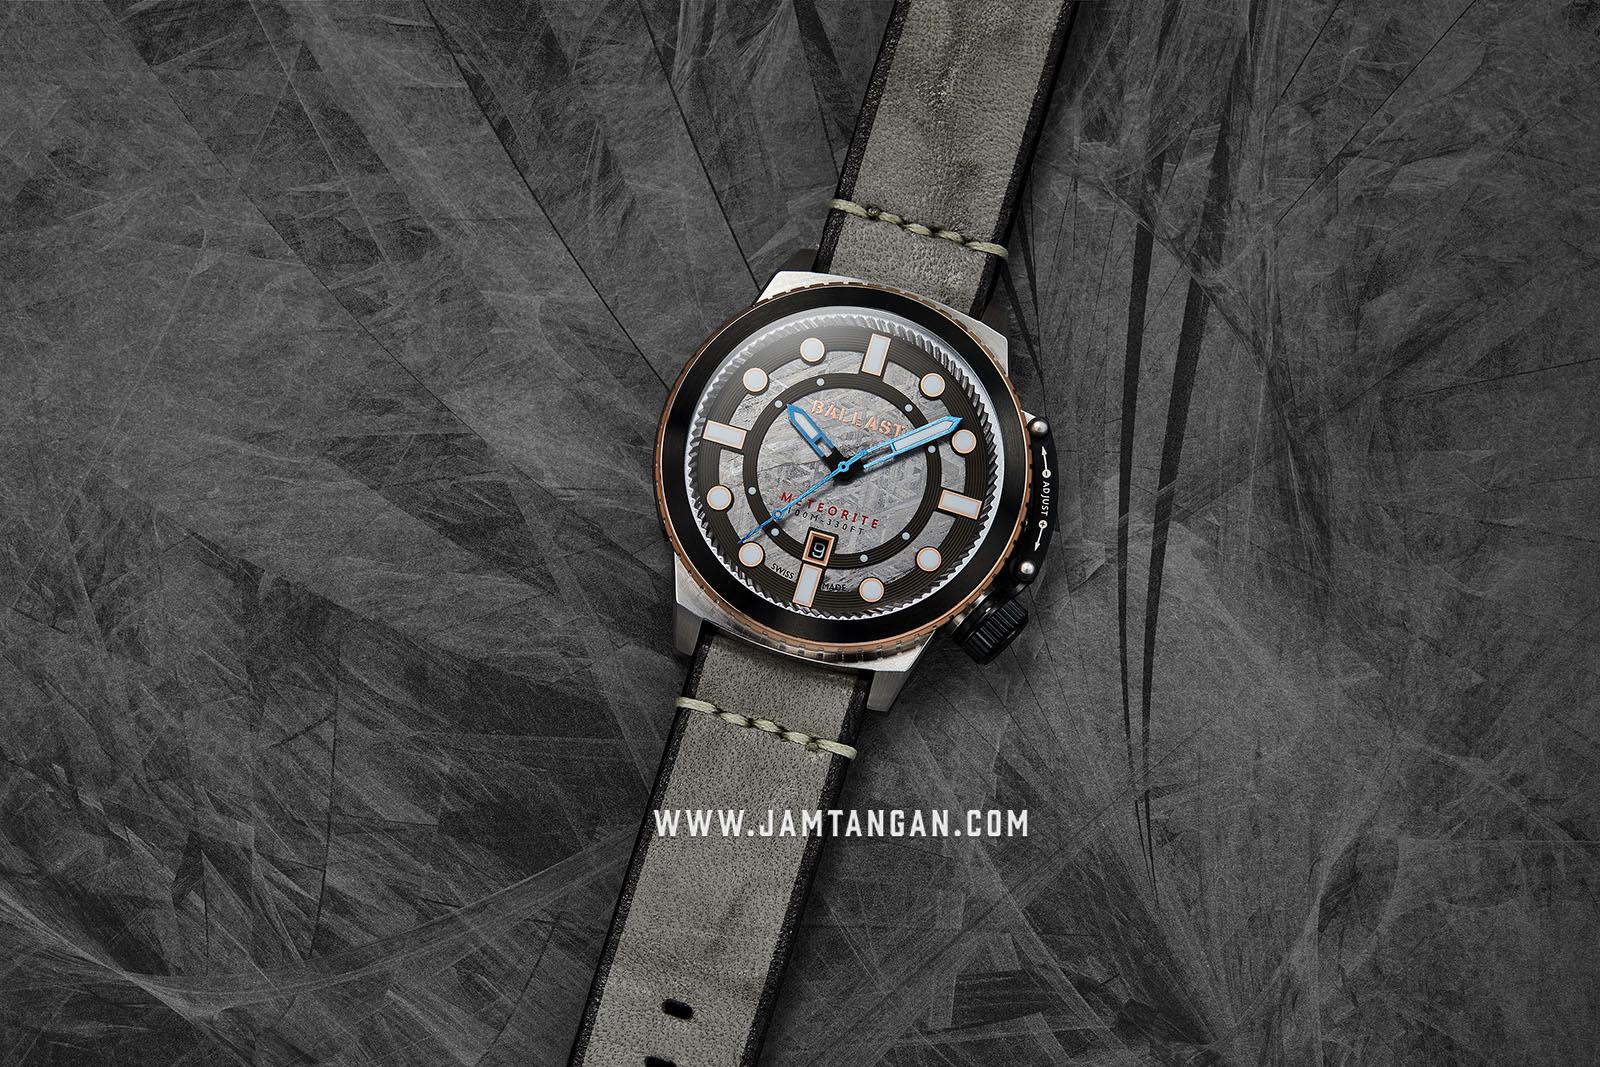 Ballast BL-3139-01 Trafalgar Conqueror Men Raw Meteorite Dial Grey Leather Strap Machtwatch